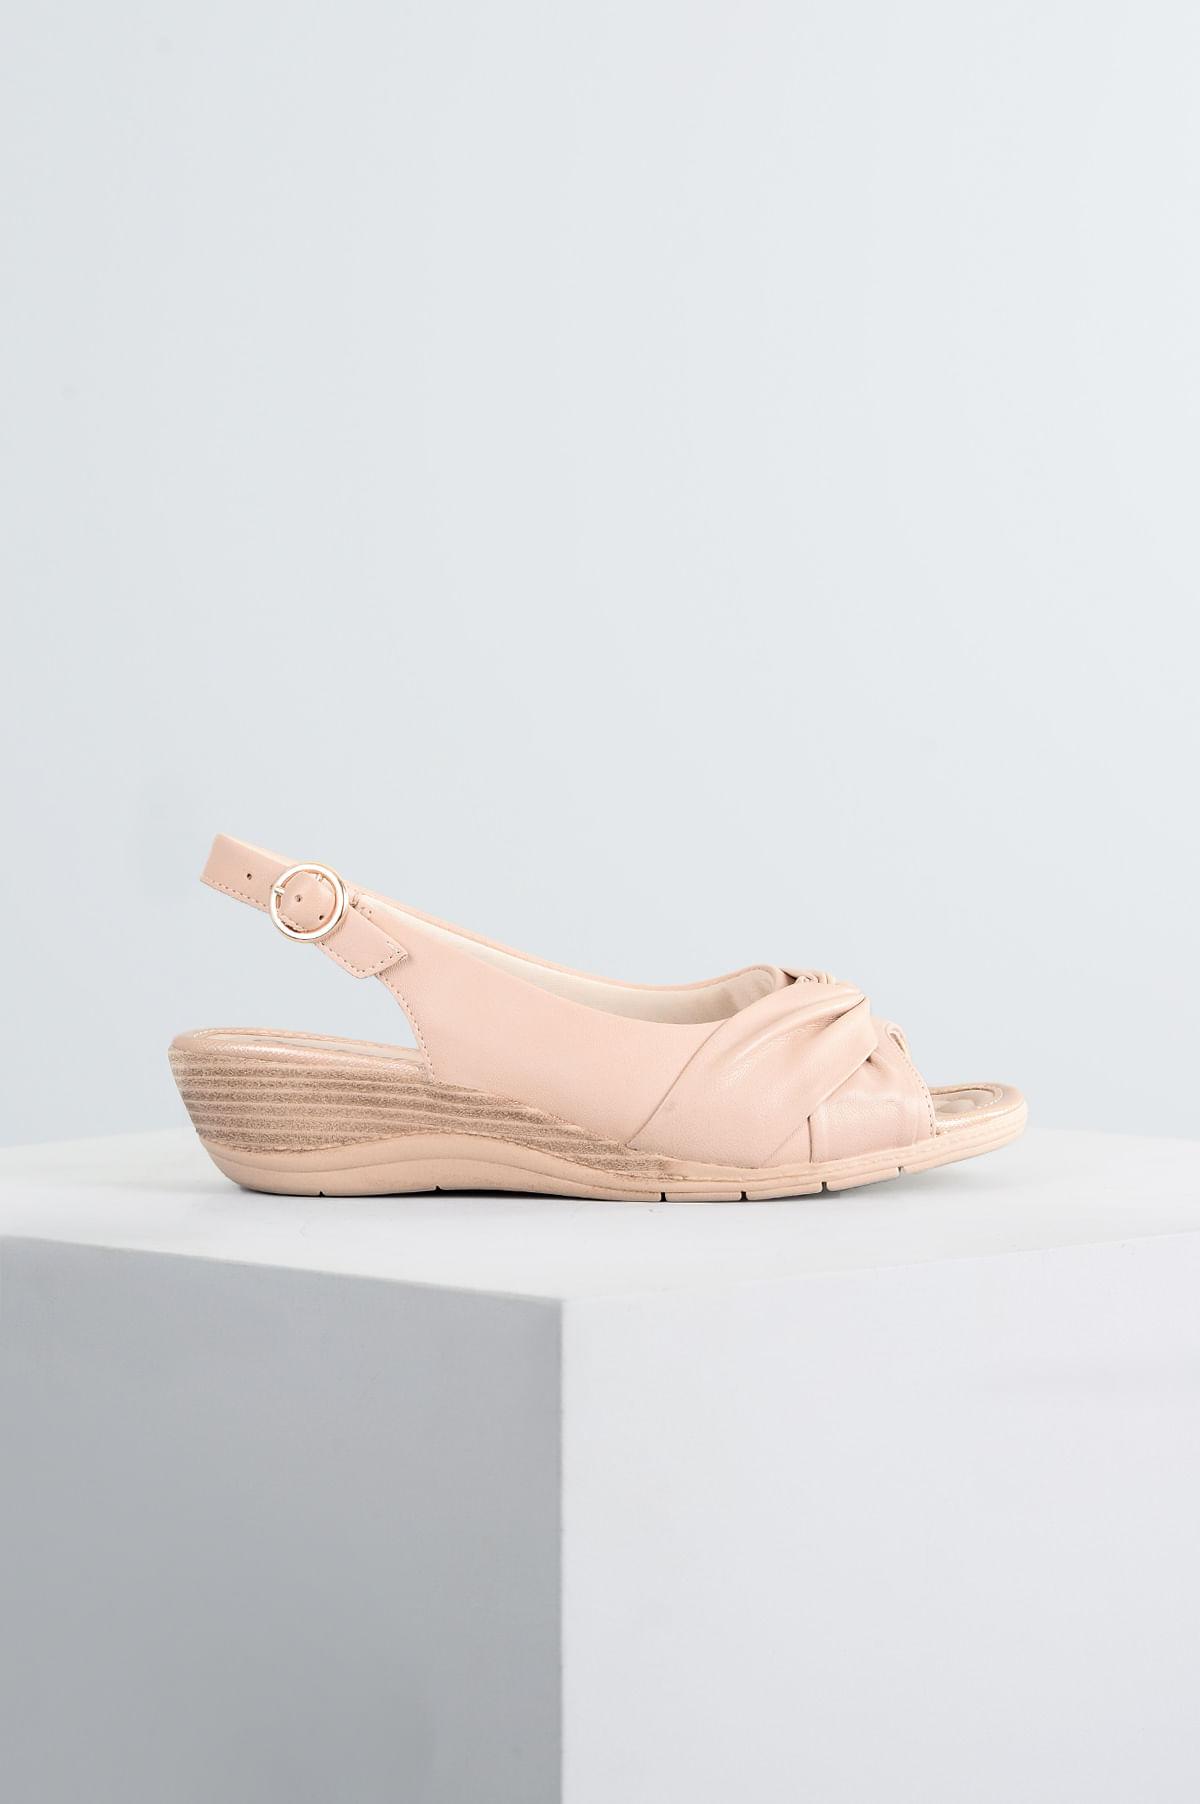 856e7320f6 Sandália Feminina Ultrasoft Comfort Flex SINT - NUDE - Mundial Calçados